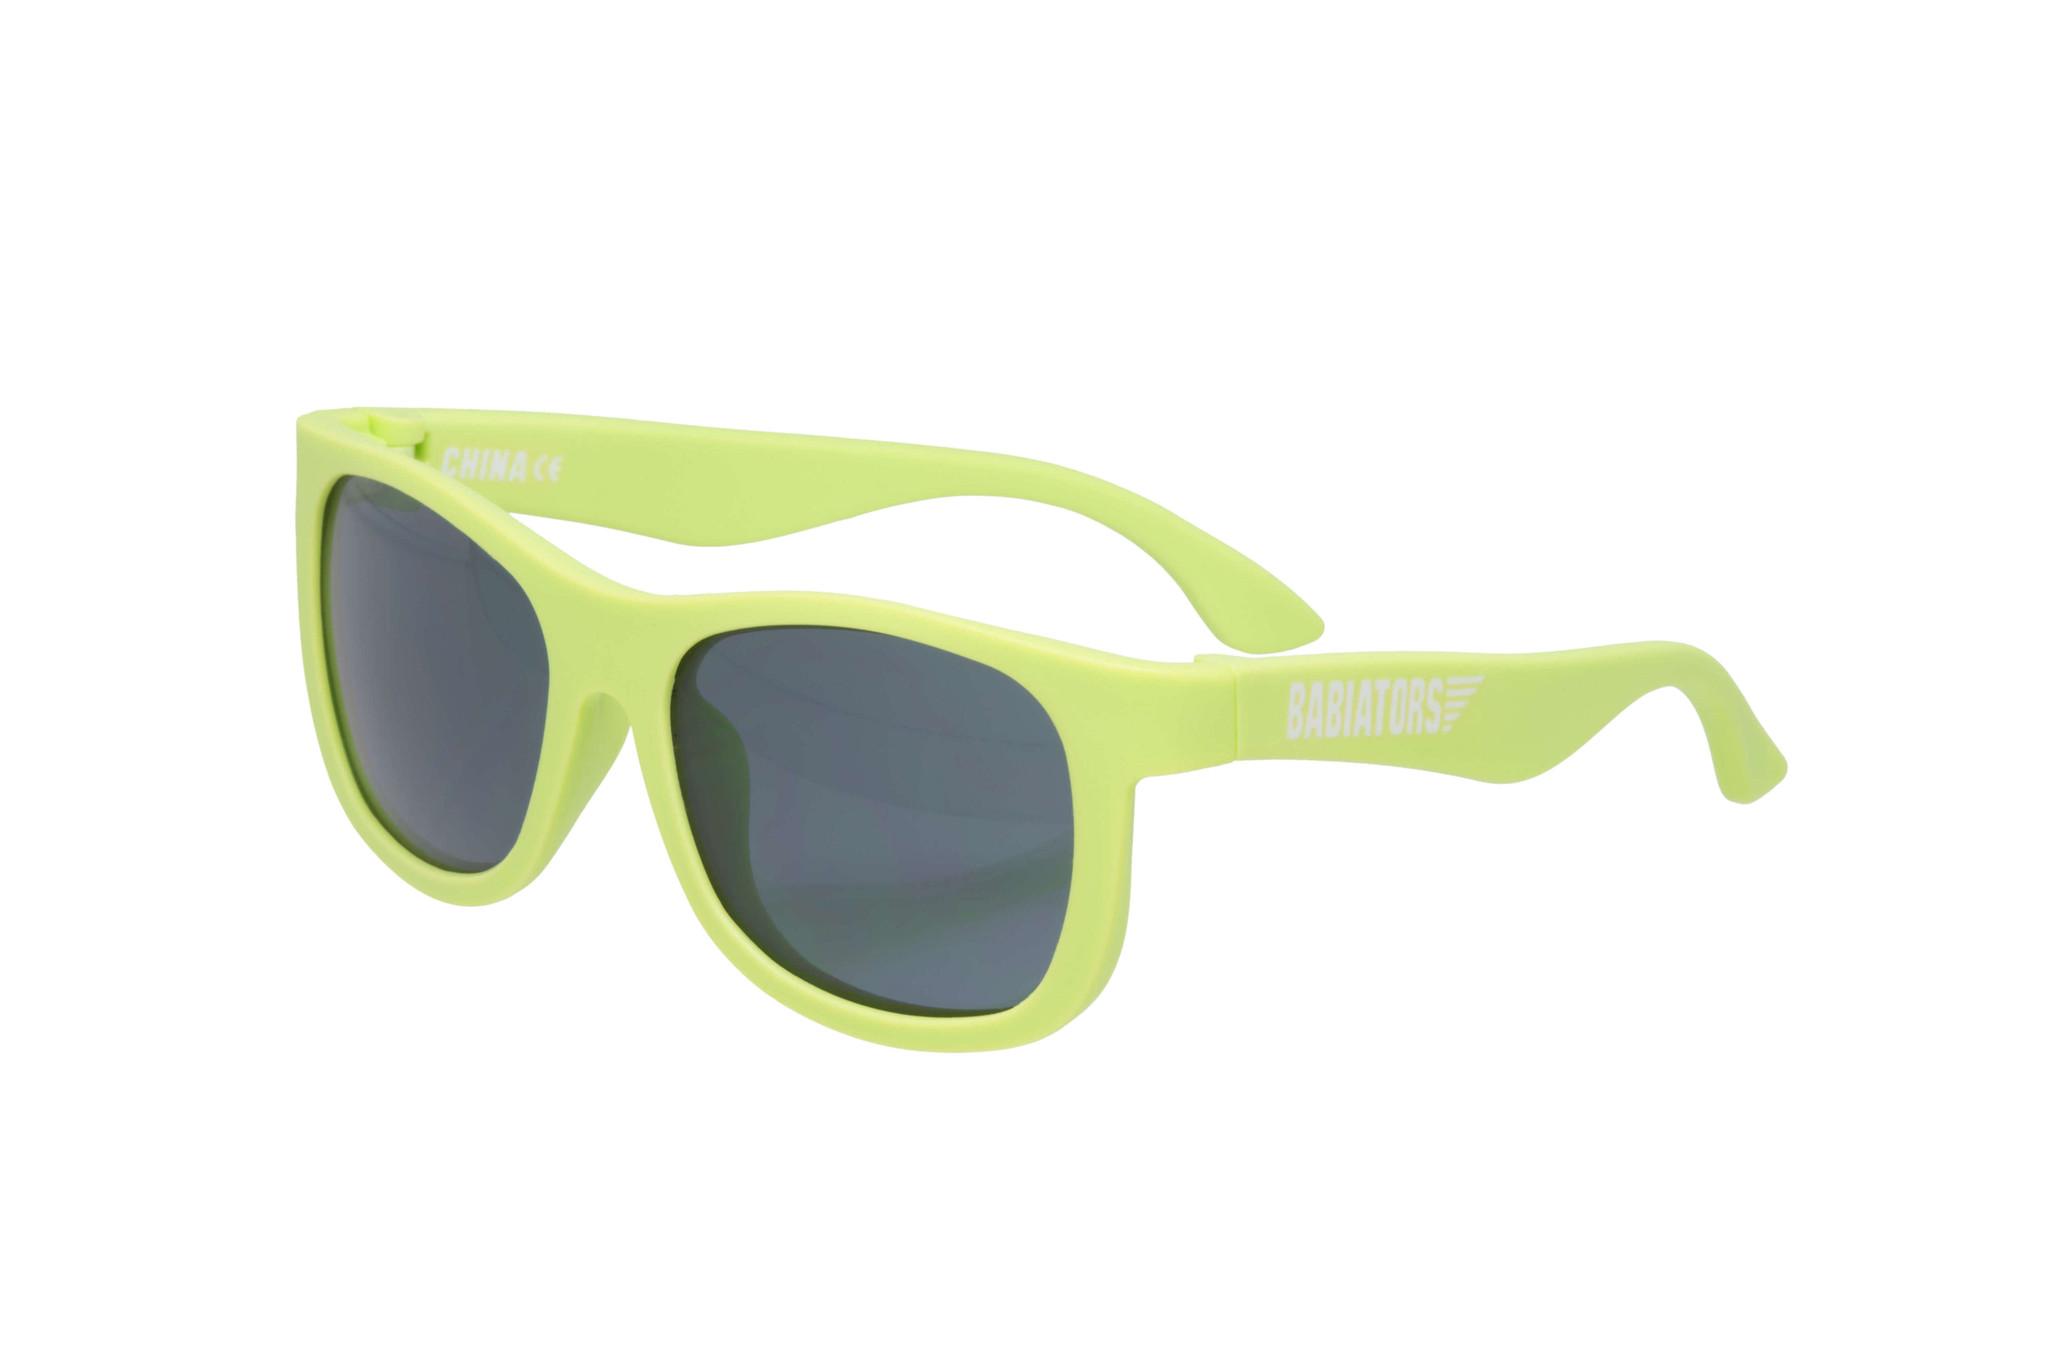 Babiators Sunglasses - Lime